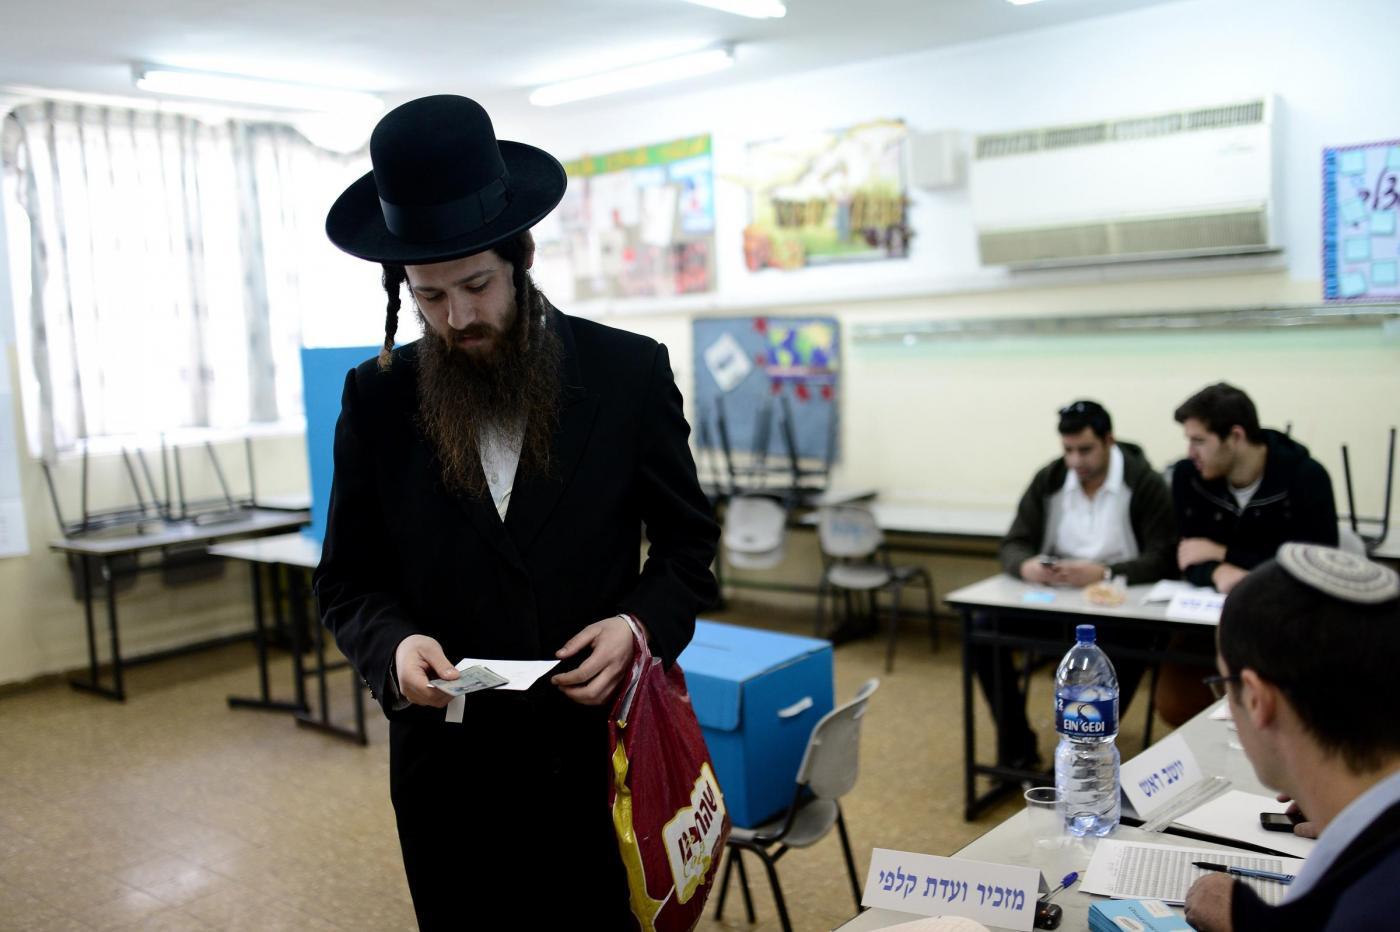 Elezioni Israele 2015: il Likud di Netanyahu vince a sorpresa